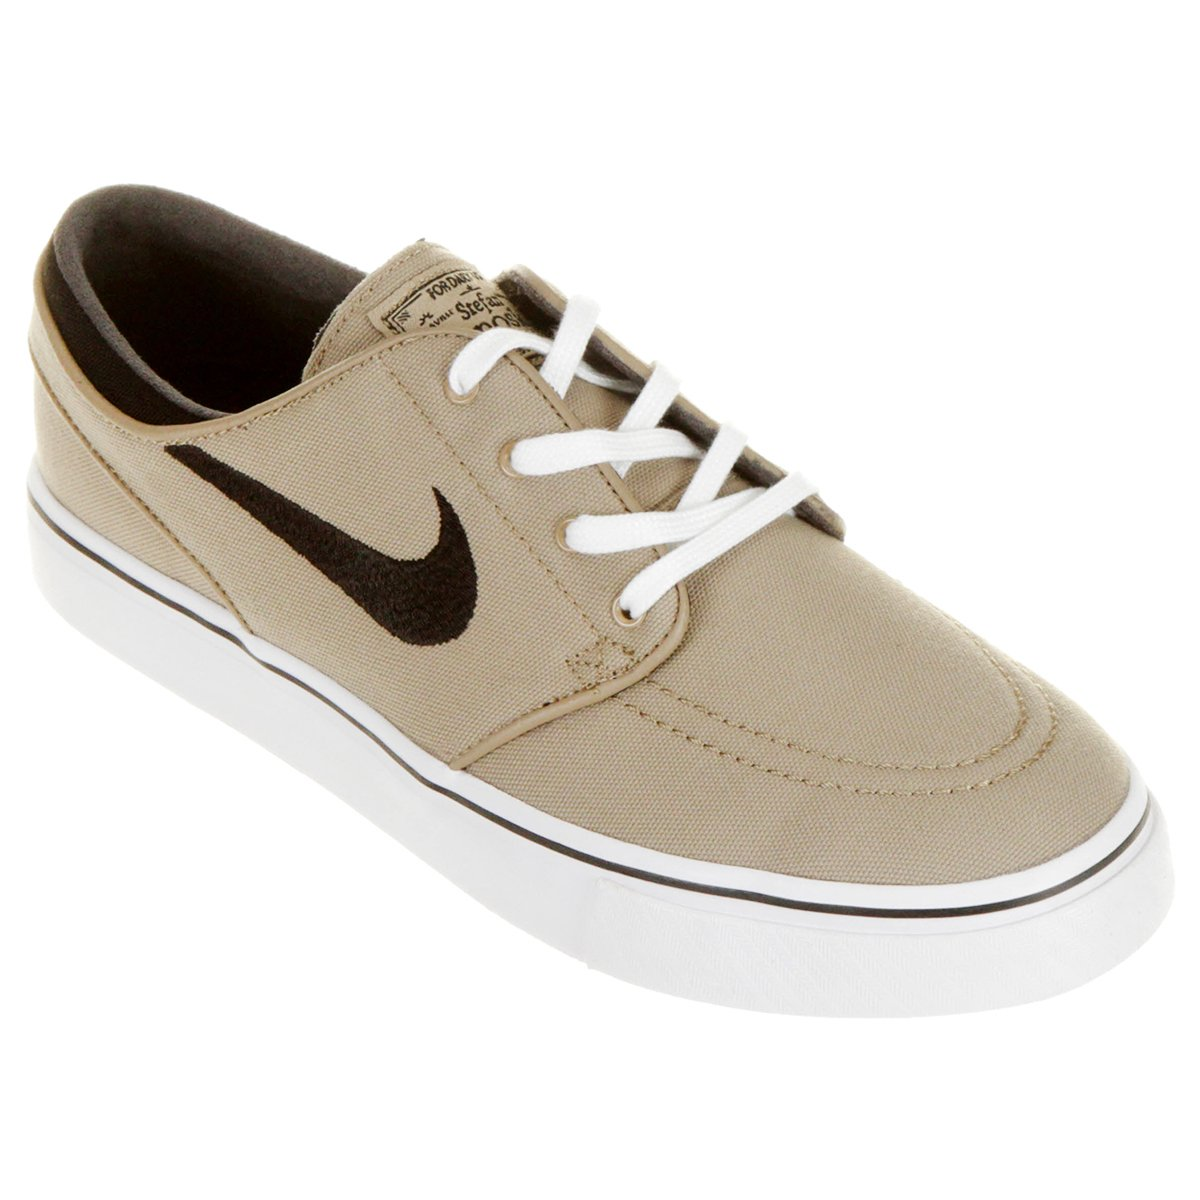 ef10ade769f Tênis Nike Zoom Stefan Janoski Cnvs - Compre Agora